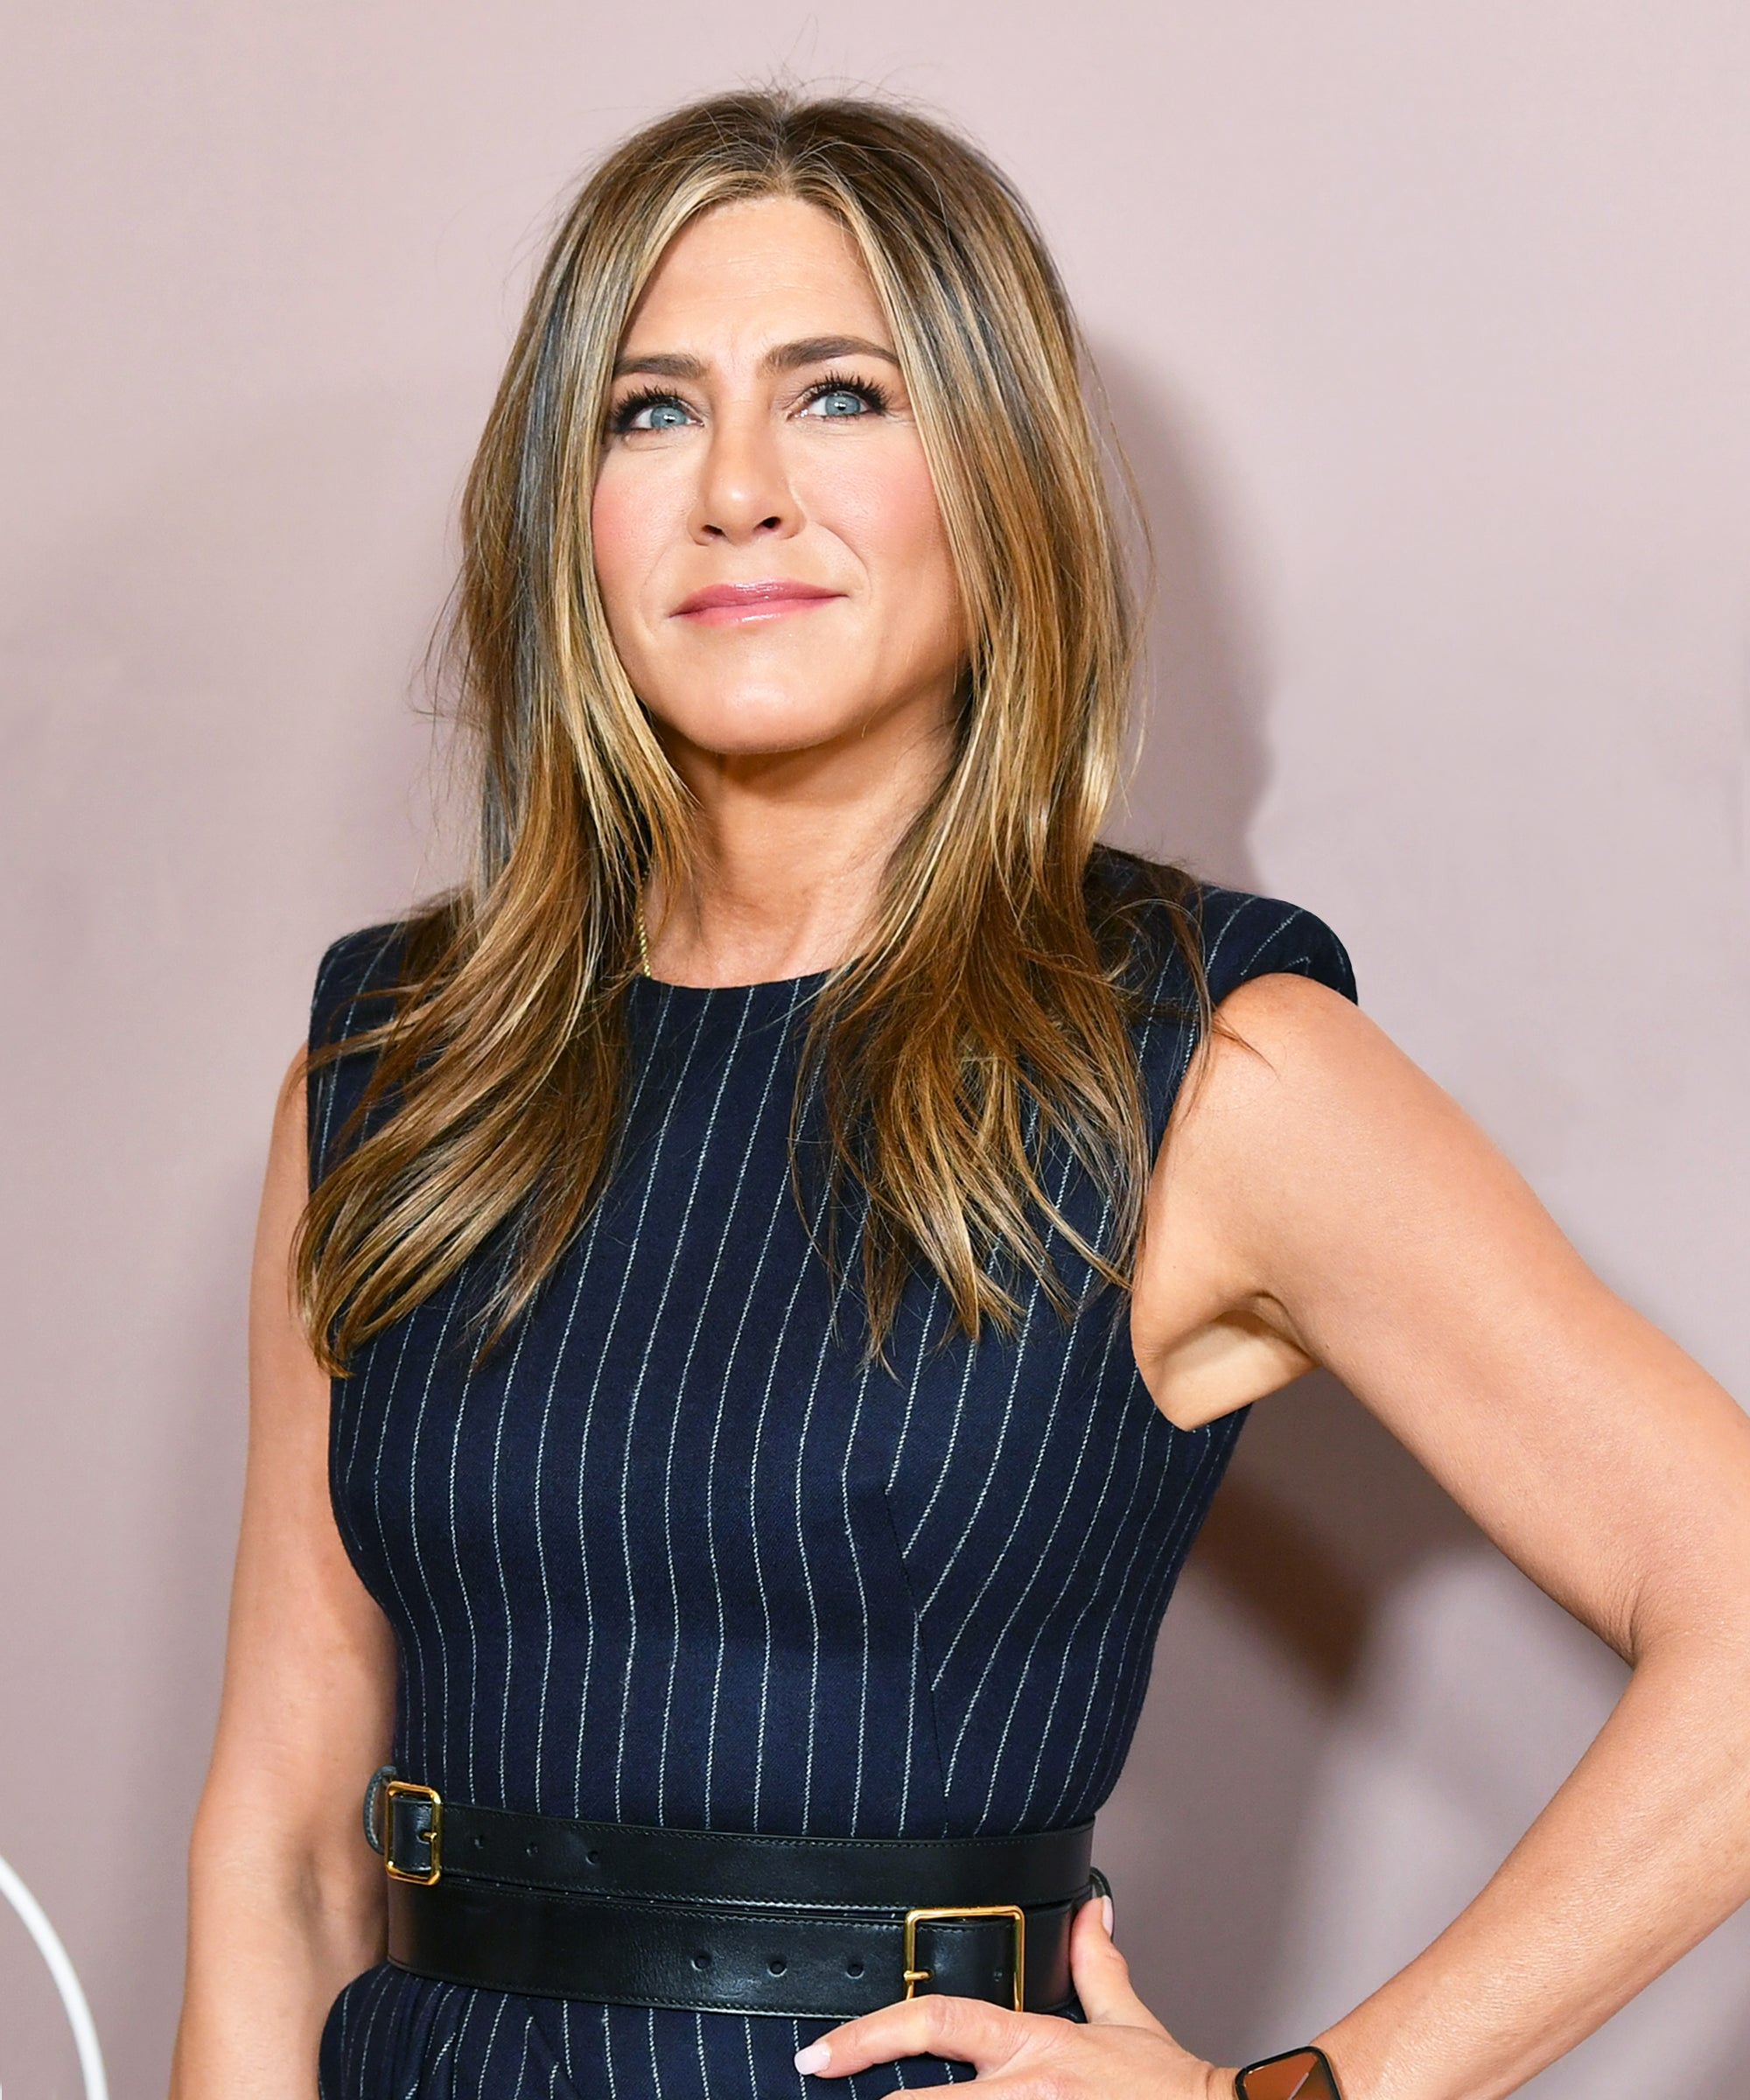 Jennifer Aniston - Interview Magazine March 2020 (7 Photos)